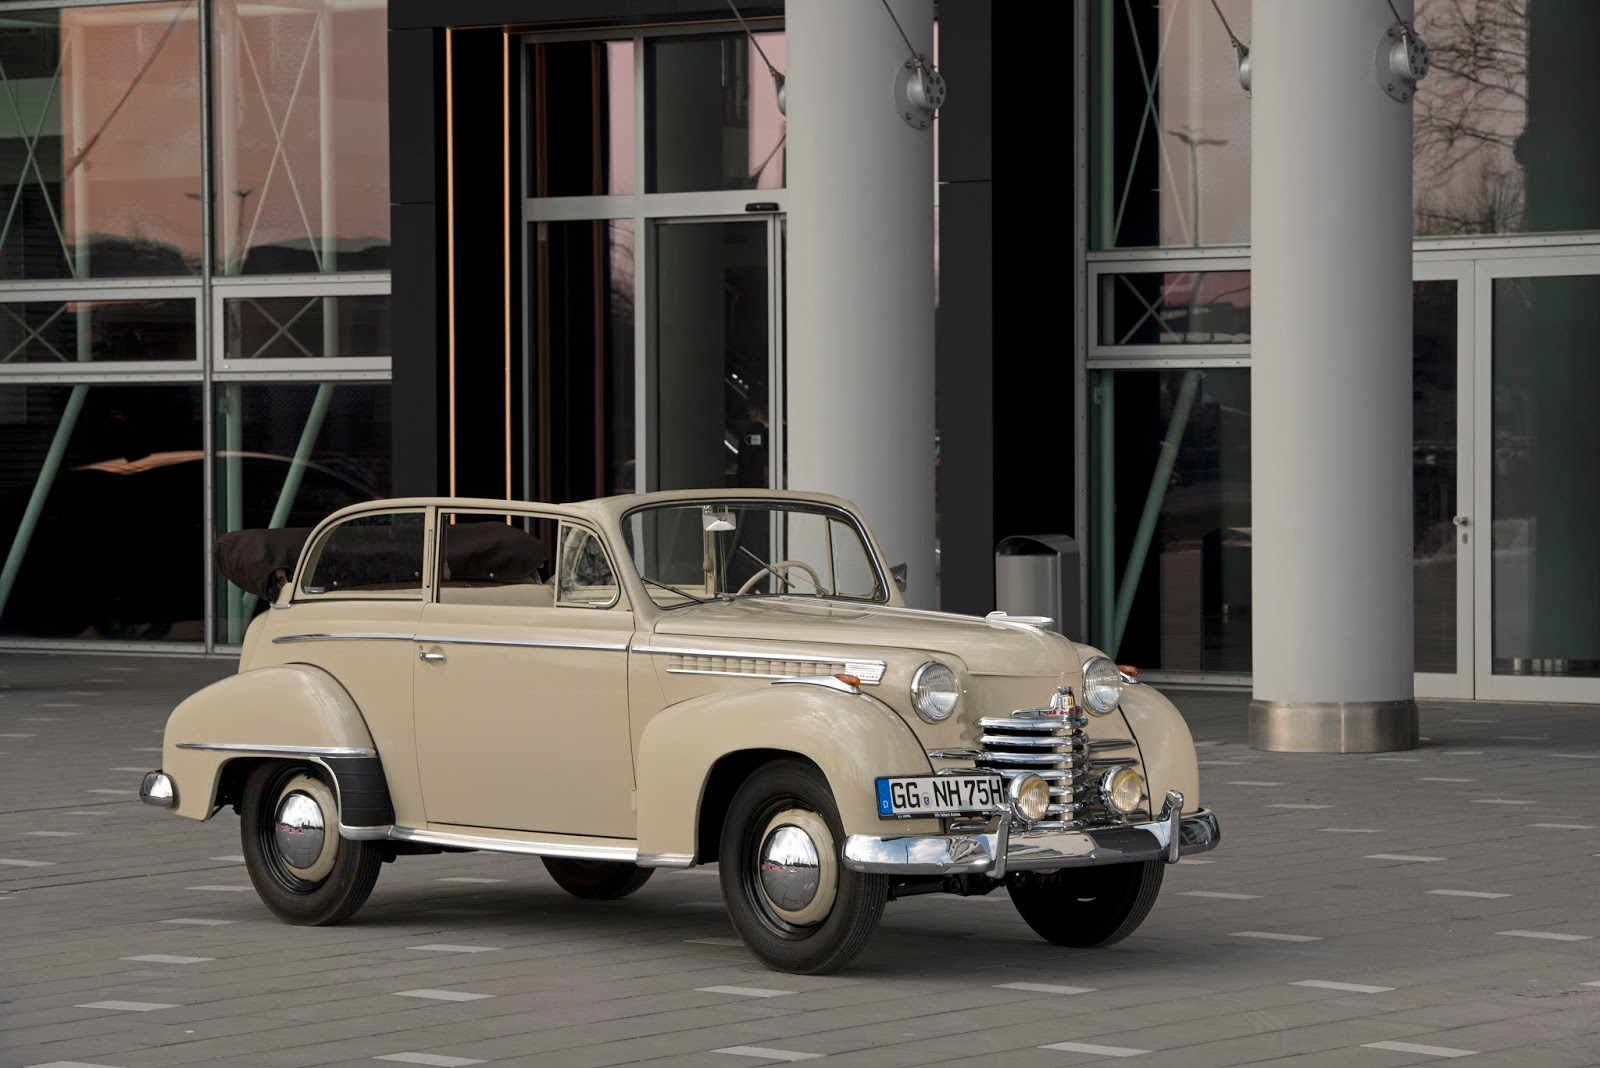 Opel Rallye Hessen Th25C325BCringen 301763 H Πλούσια Κληρονομιά των Opel Cabrio cabrio, Opel, Opel 8/25 hp, Opel Cascada, Opel Olympia, Opel Record, Opel Super 6